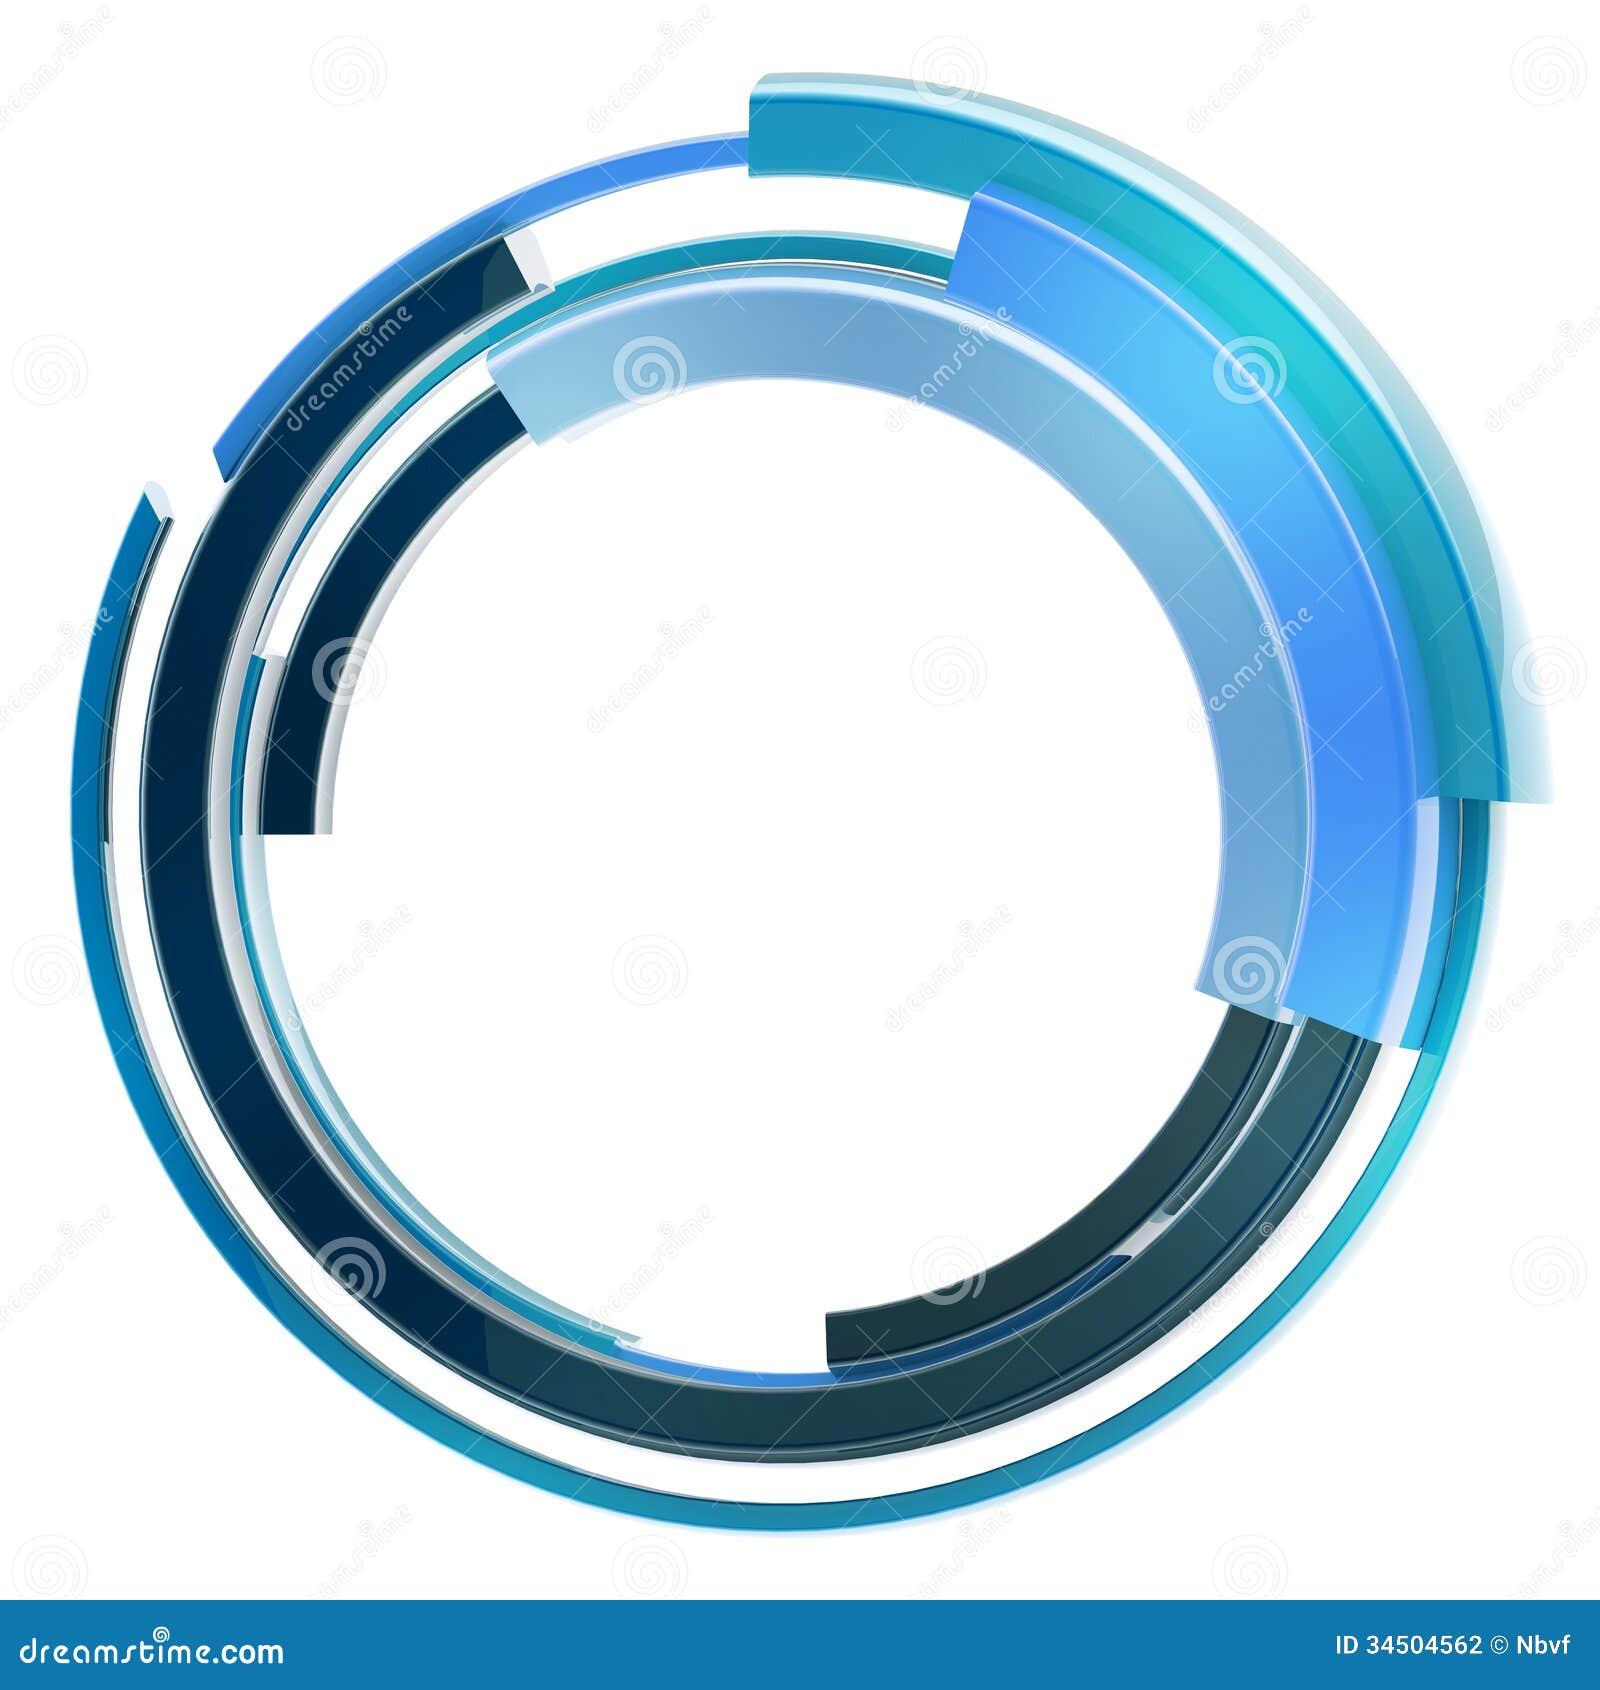 Abstract Techno Circular Frame Border Isolated Stock